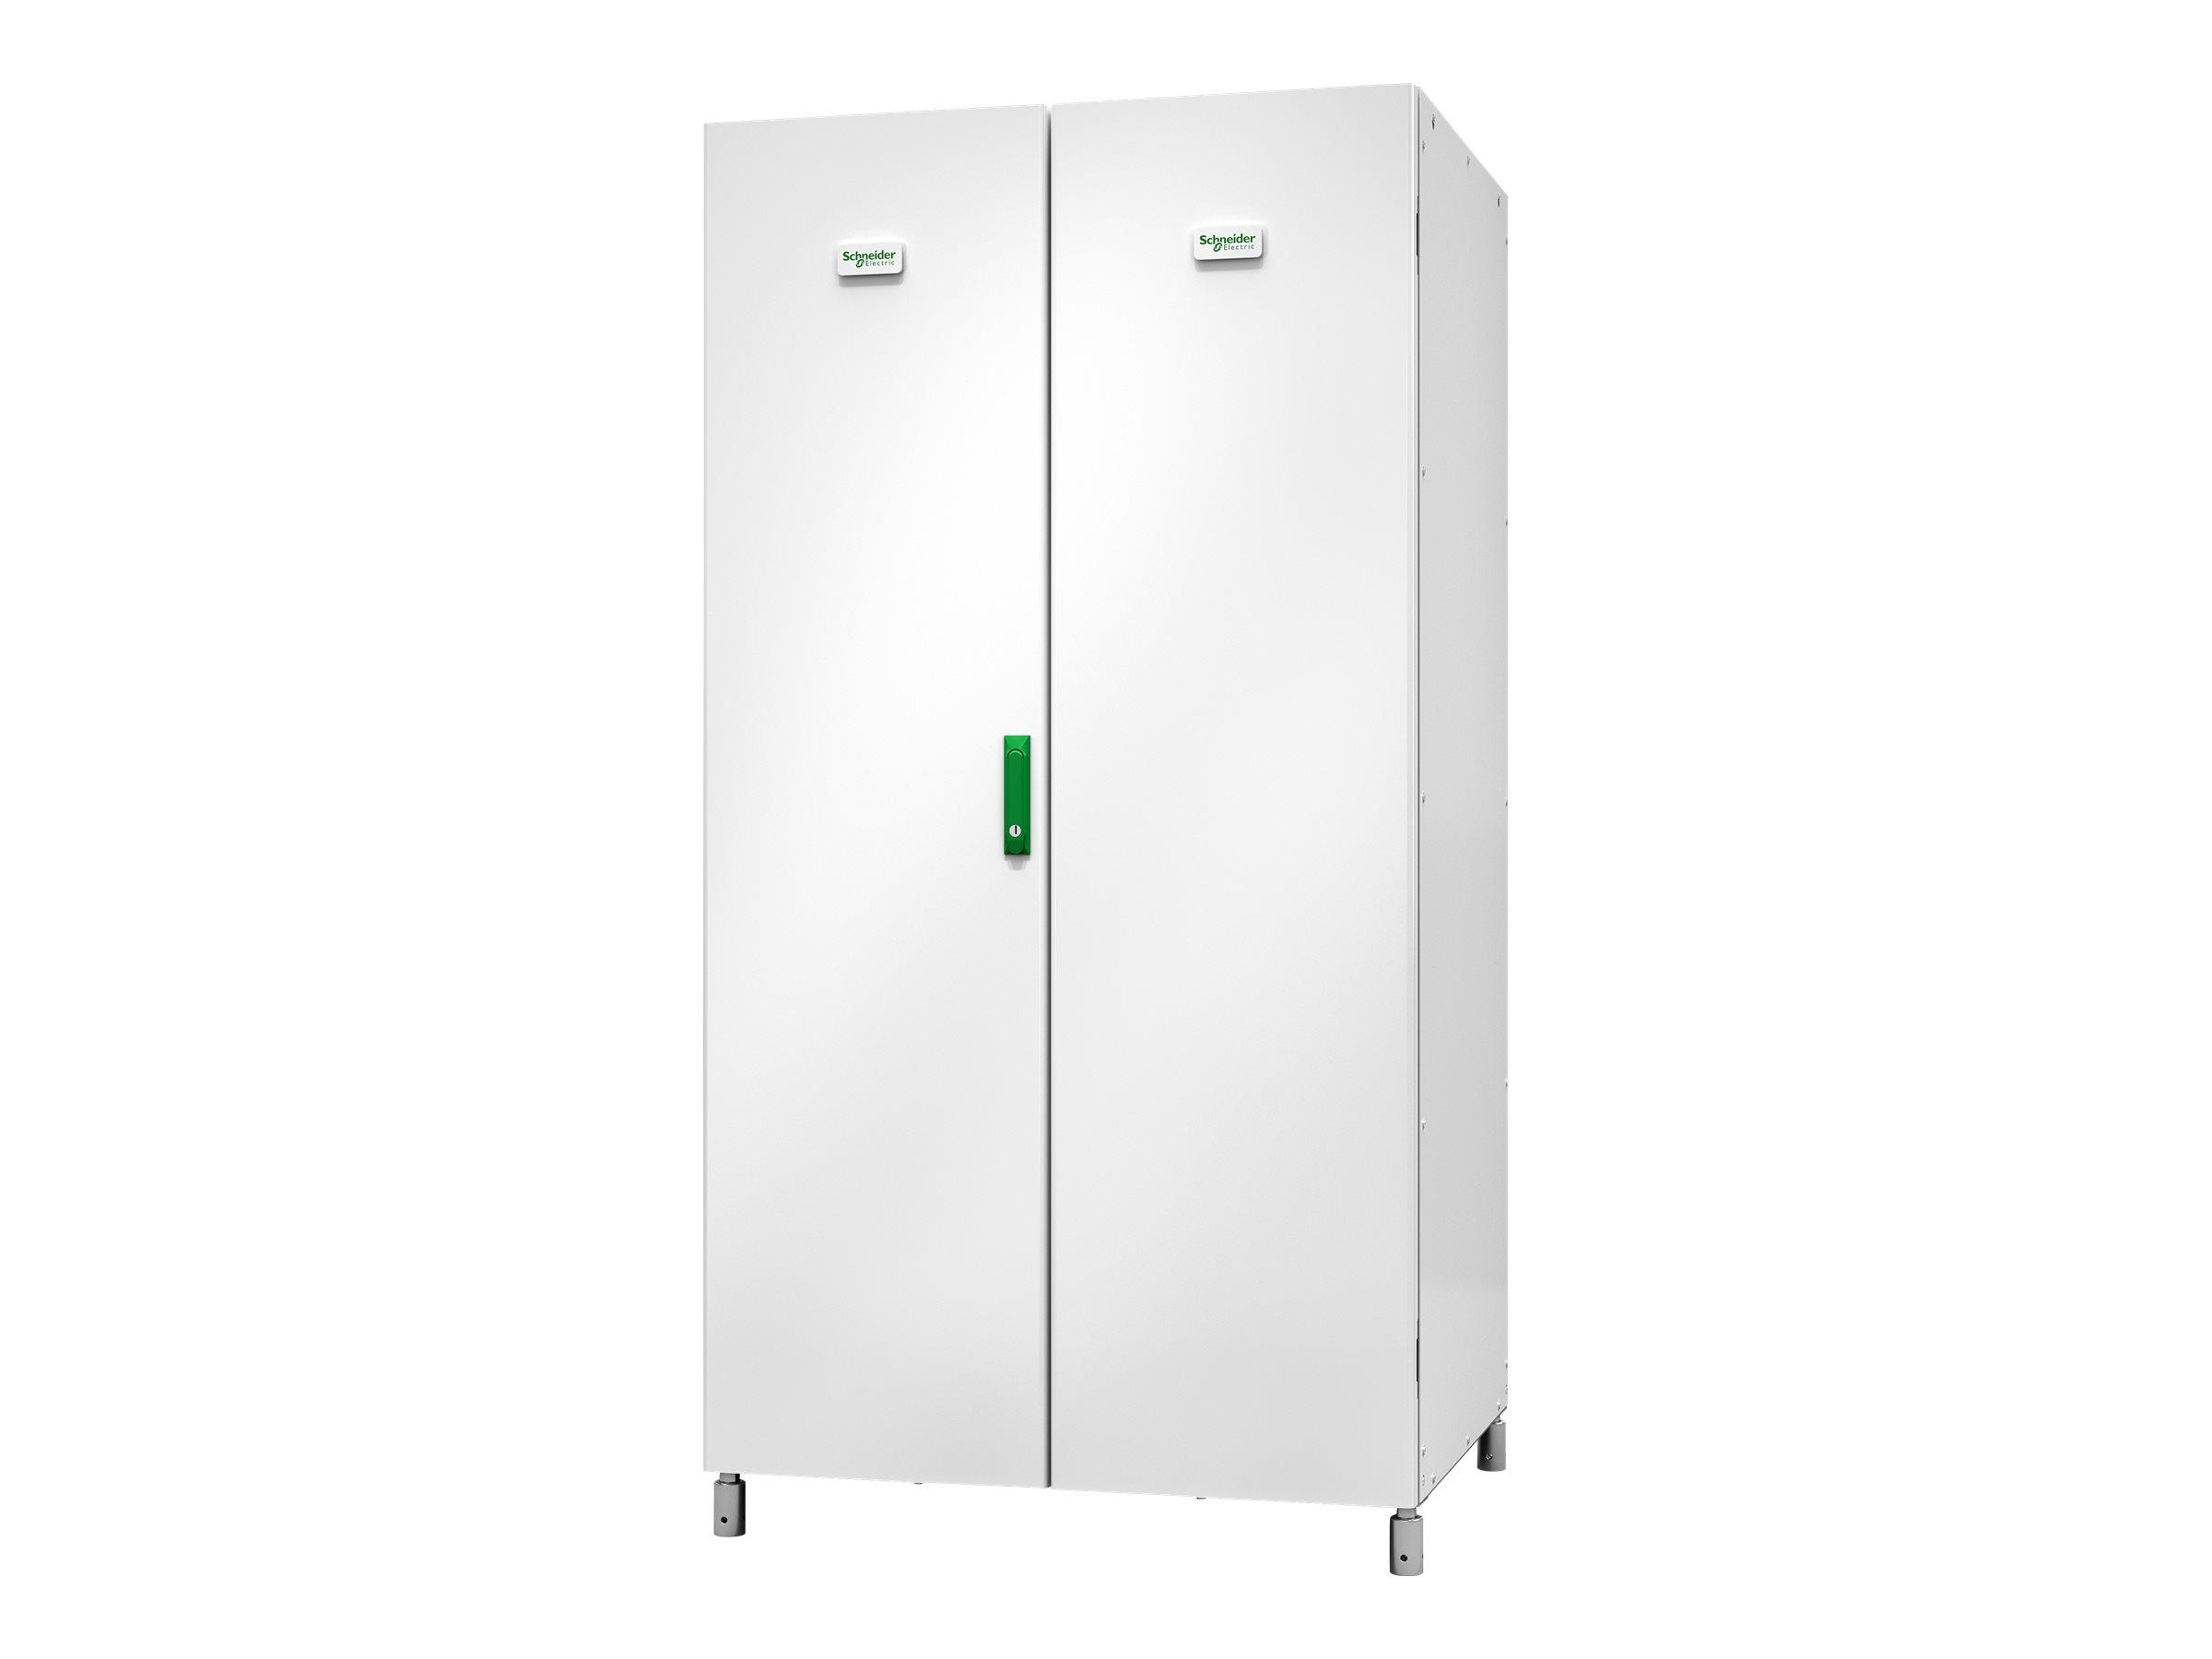 Schneider Electric Galaxy VS Classic Battery Cabinet - Config B - Batteriegehäuse - weiss